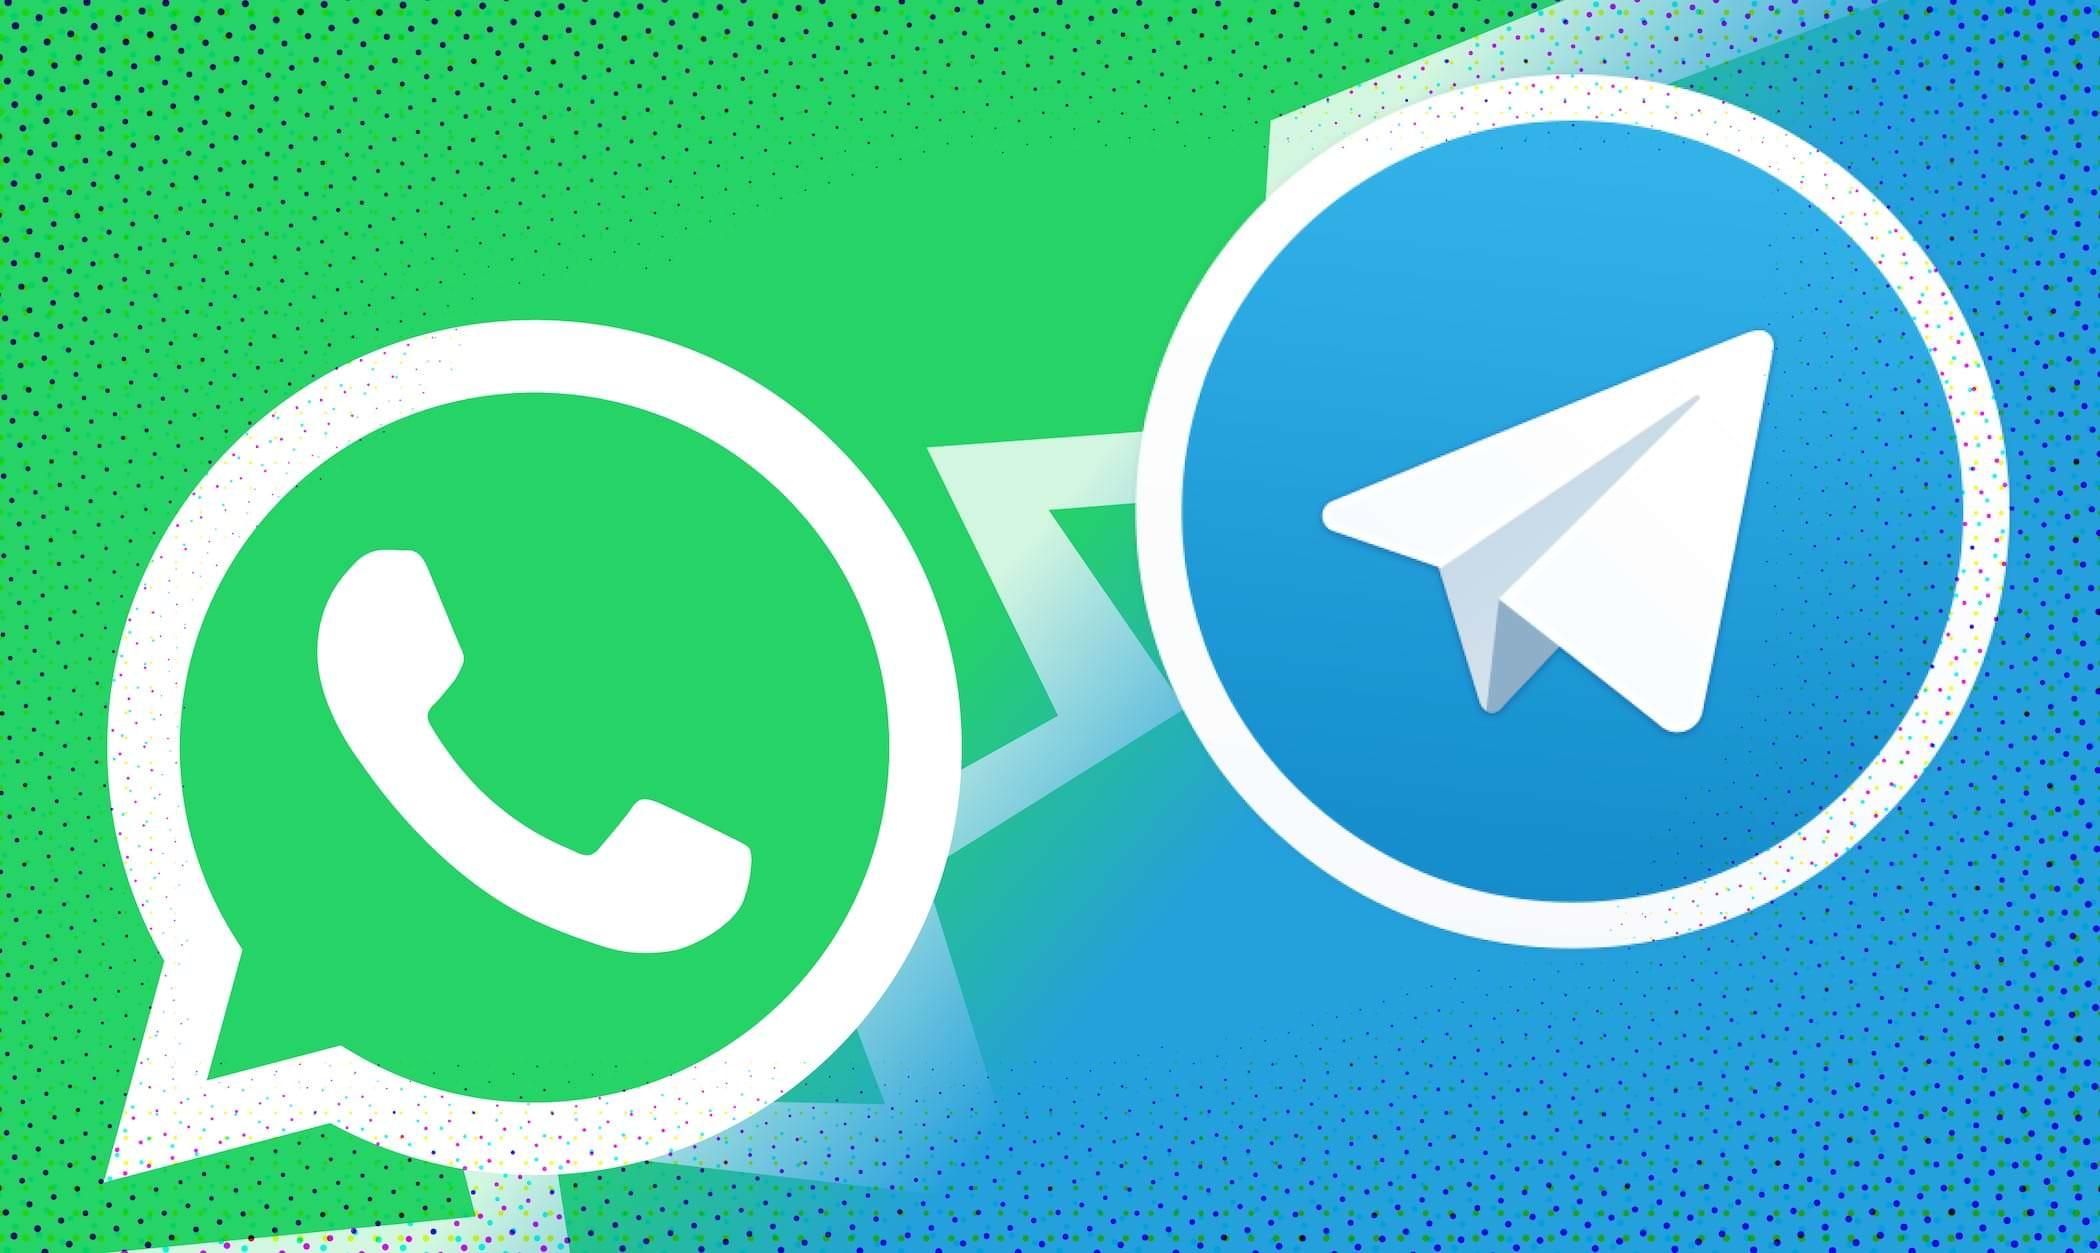 Как перенести чаты из WhatsApp в Telegram на iPhone